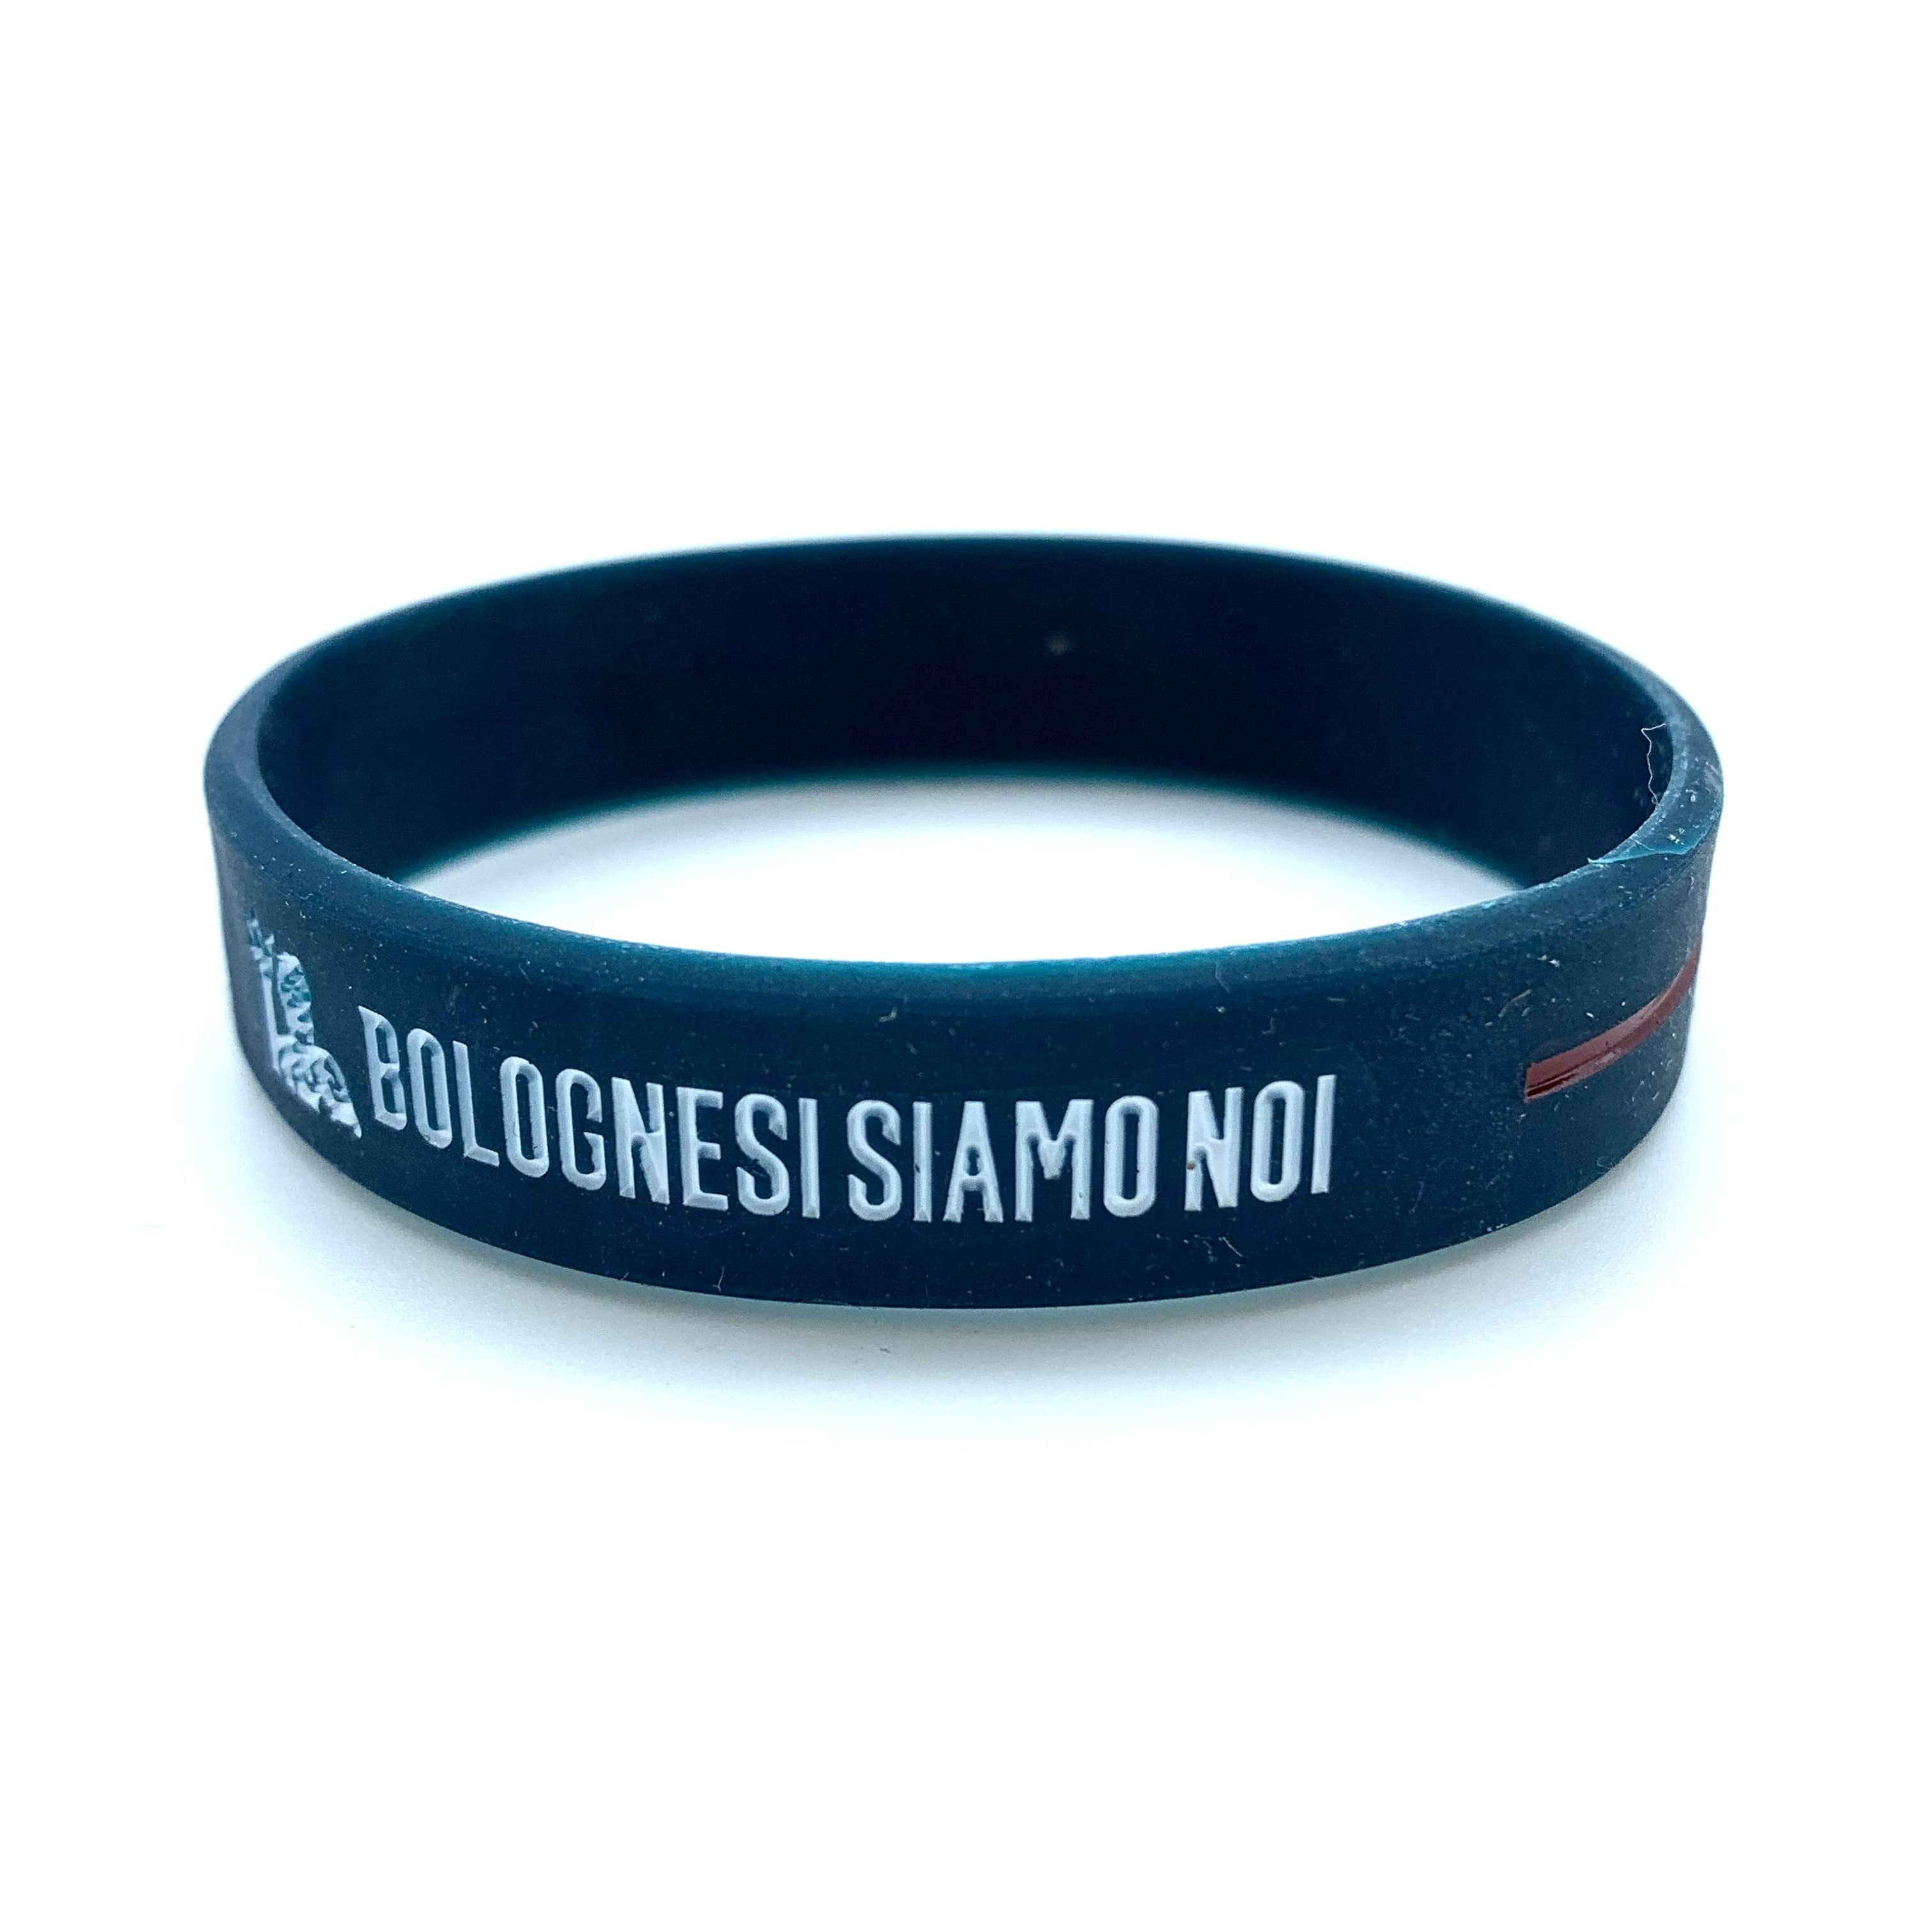 Bologna Fc BRACCIALETTO BOLOGNESI SIAMO NOI Bambino